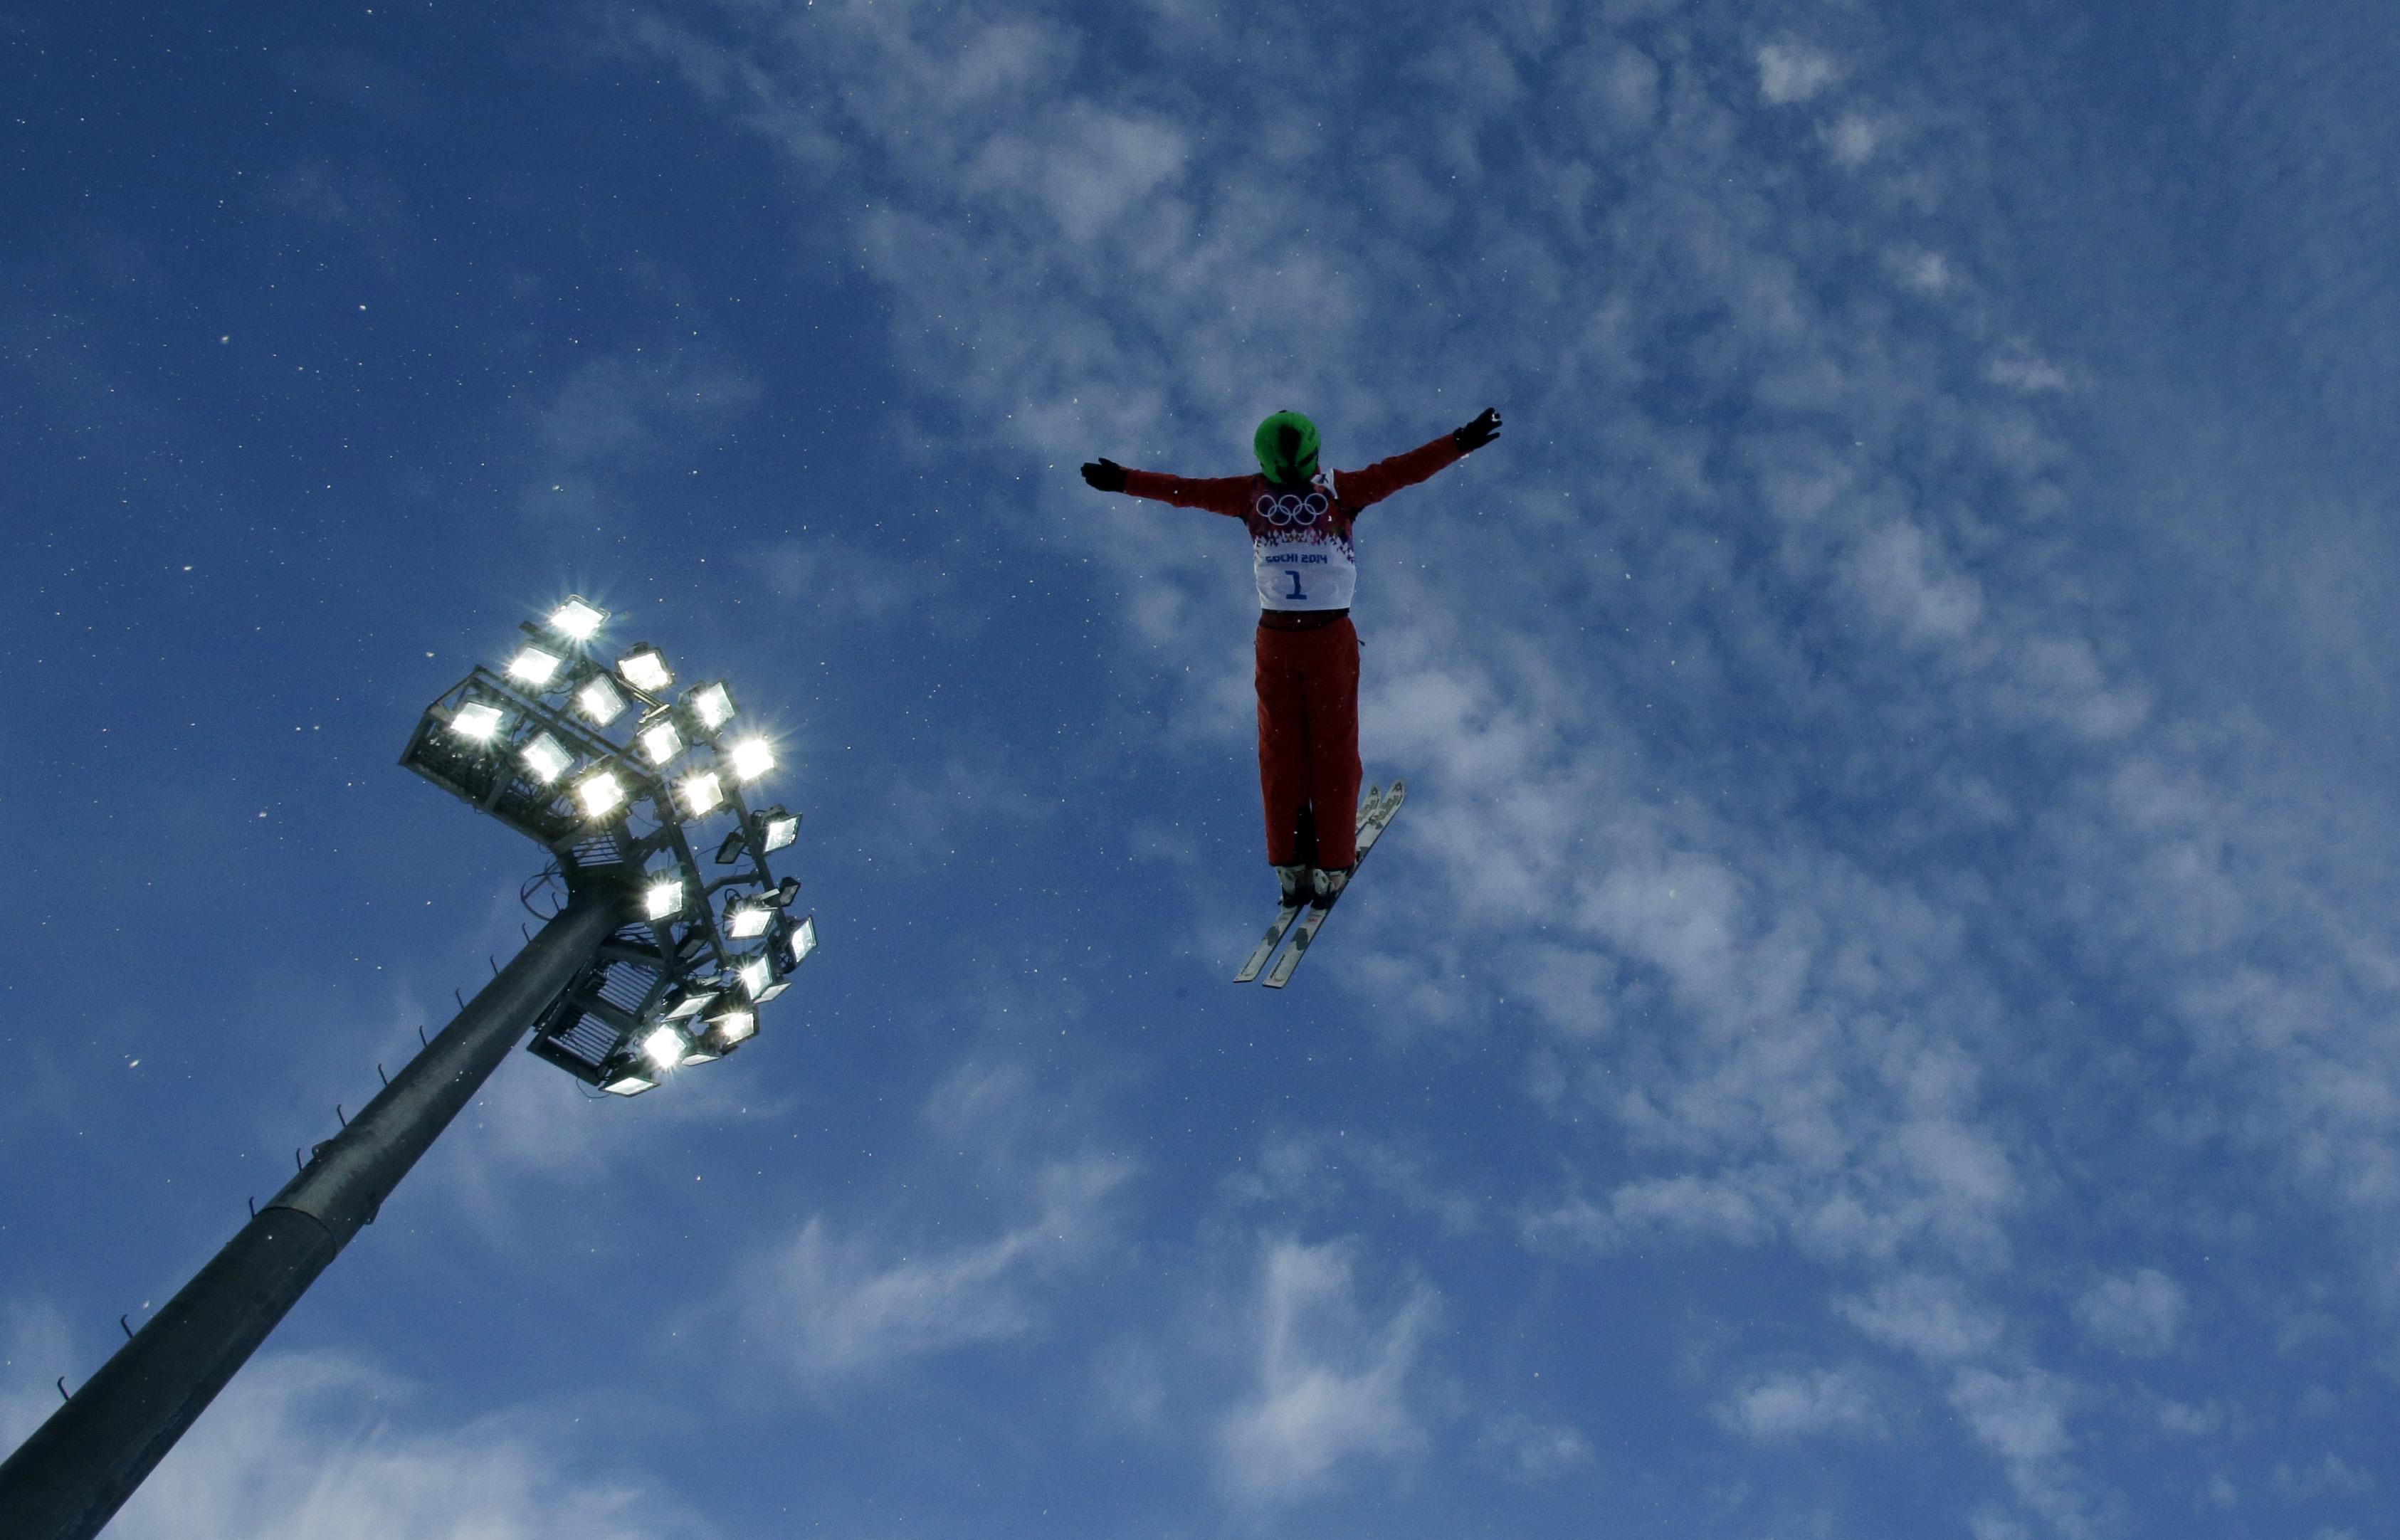 China's Li Nina jumps during women's freestyle skiing aerials training at the Rosa Khutor Extreme Park, at the 2014 Winter Olympics, Friday, Feb. 14, 2014, in Krasnaya Polyana, Russia. (AP Photo/Greg Baker)